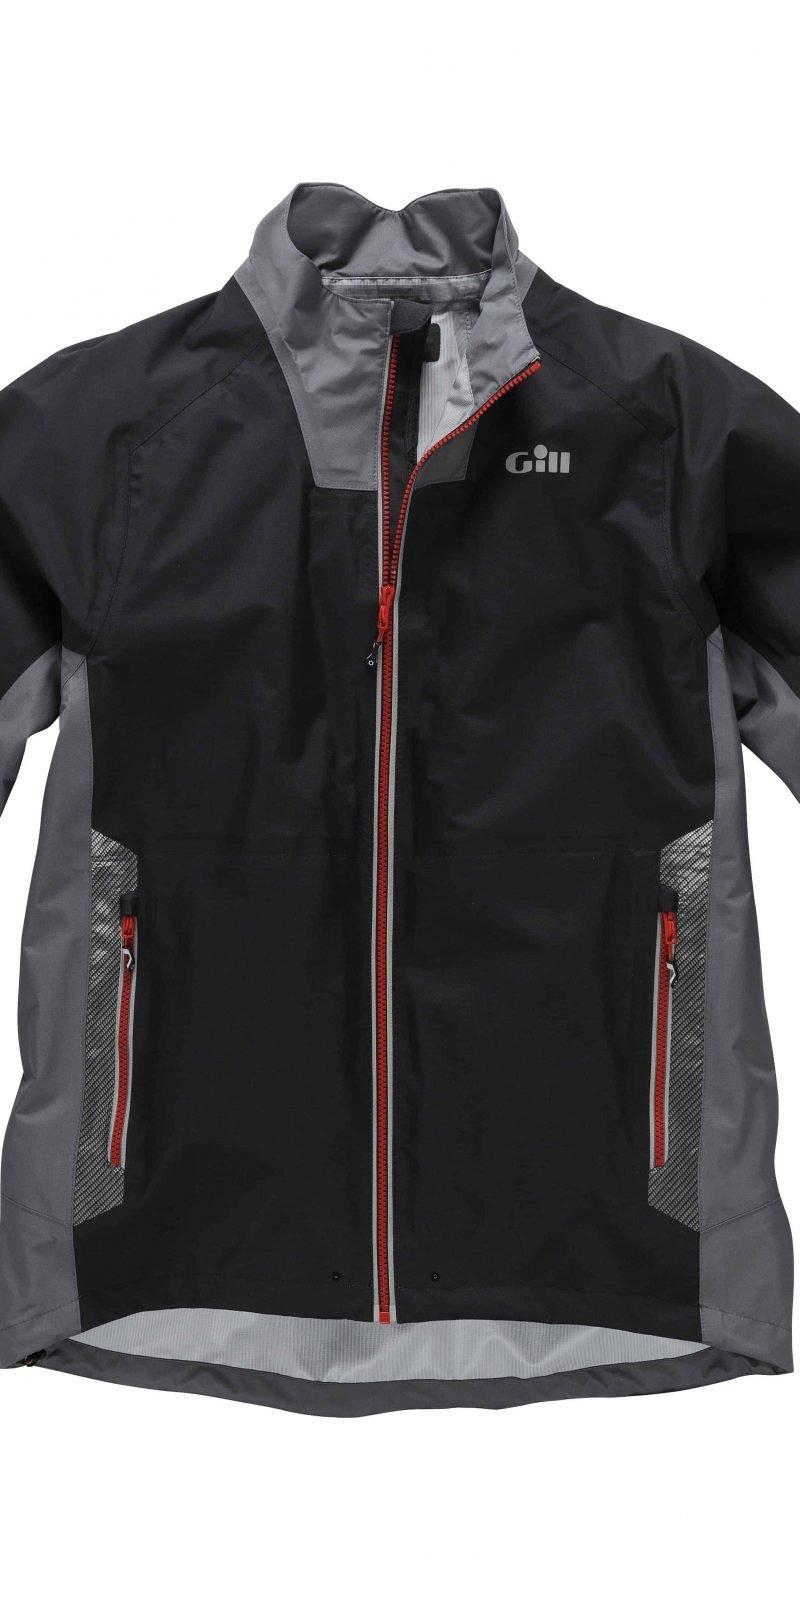 Gill – Race Jacket Mens